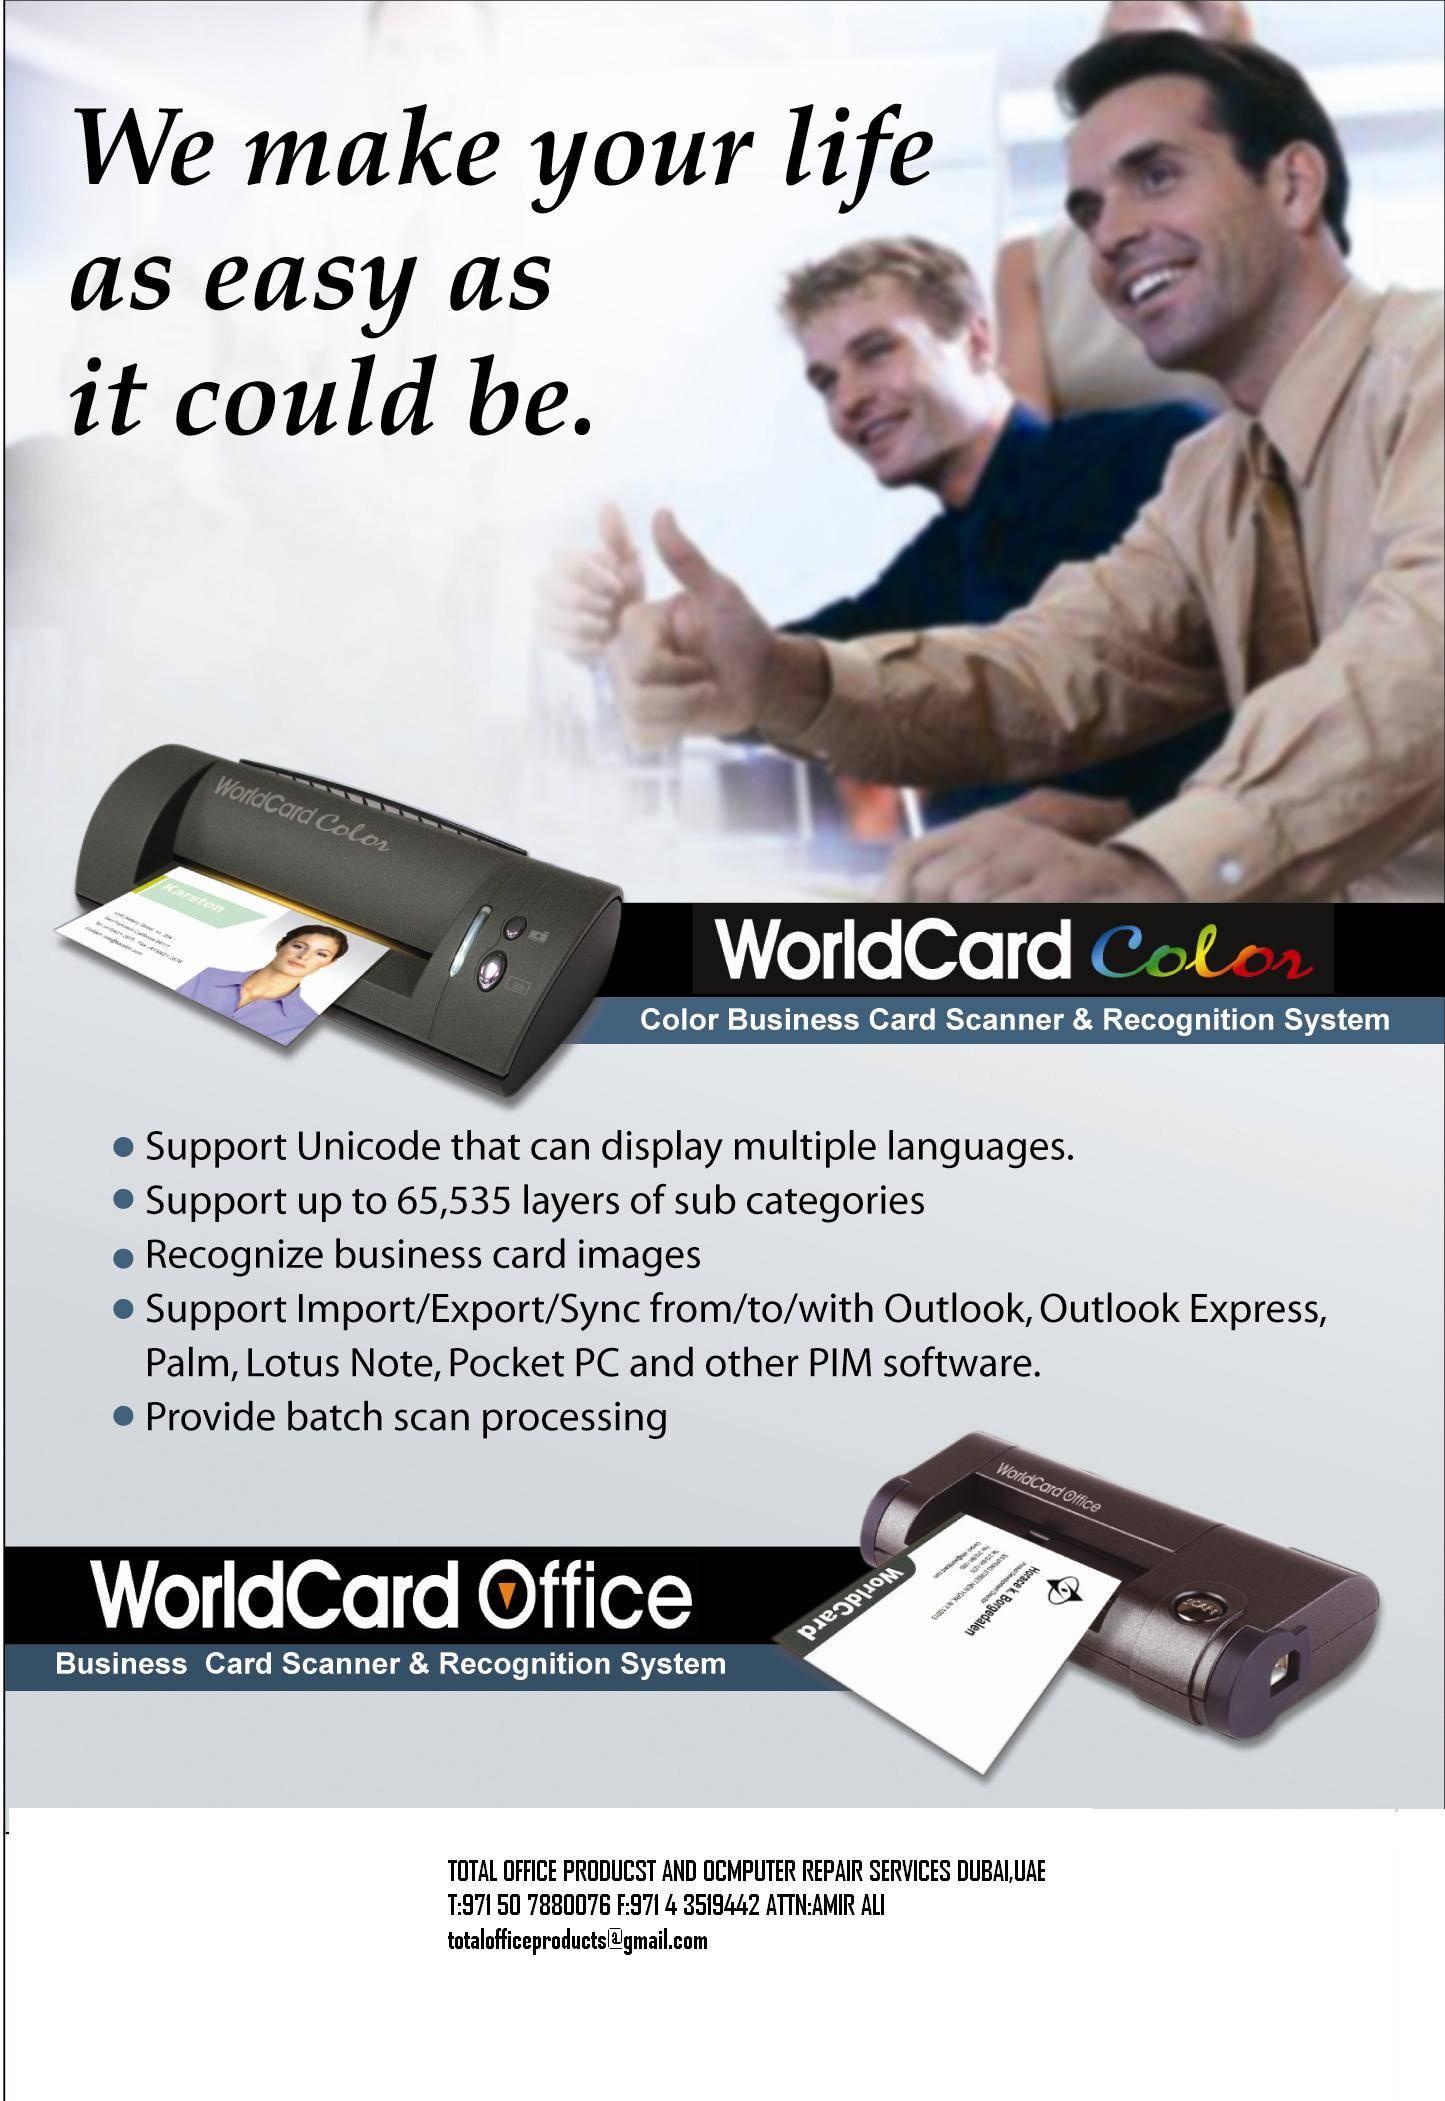 Pen power world card biz card scanner card scanner business card pen power world card biz card scanner card scanner business card scanner colourmoves